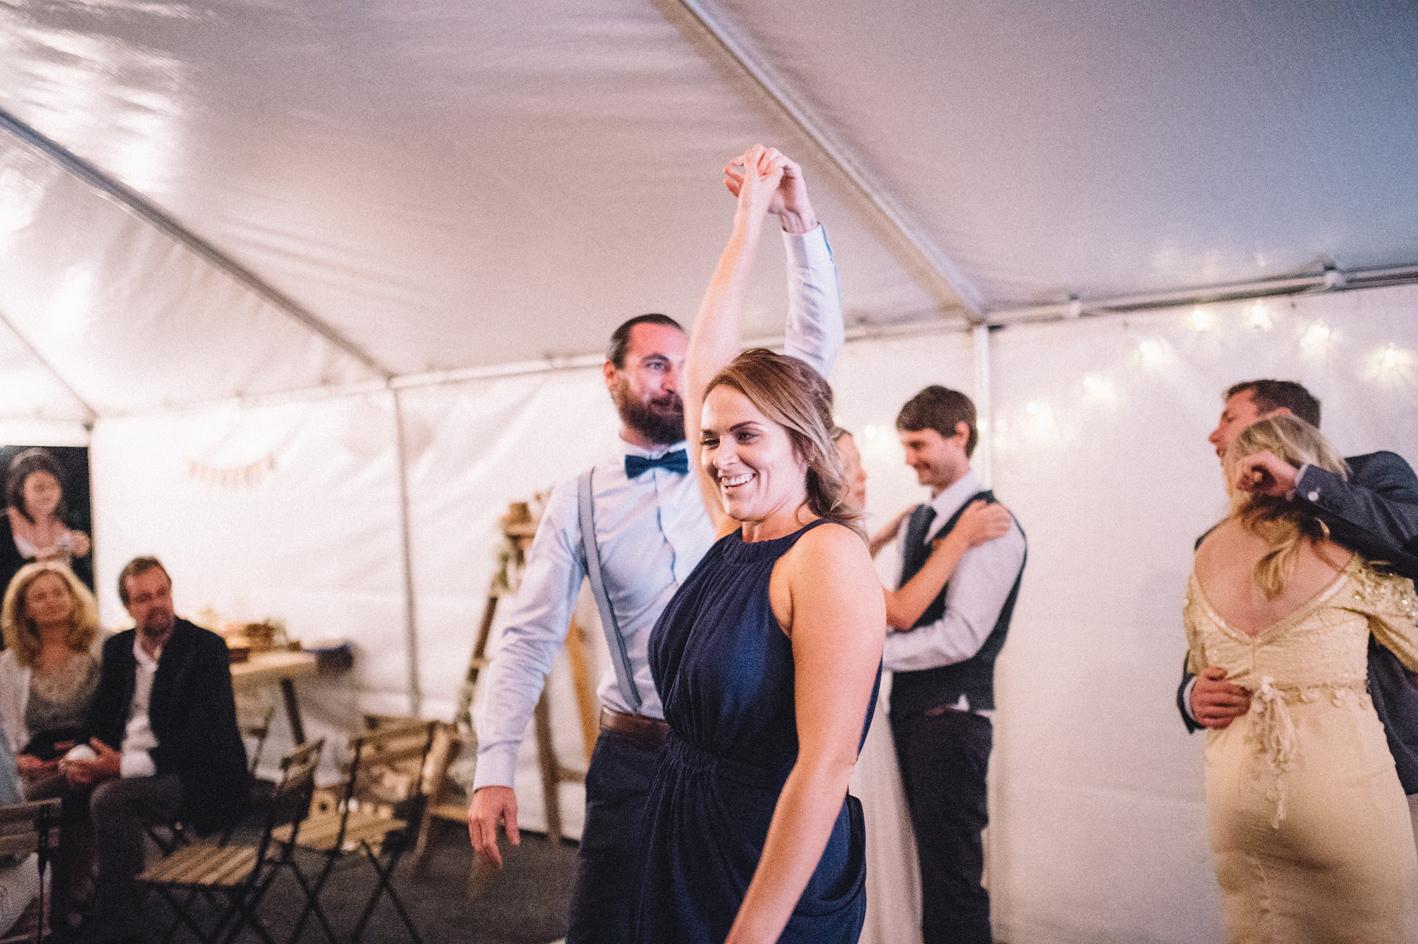 091-michelle-reagan-mount-tamborine-wedding-sophie-baker-photography